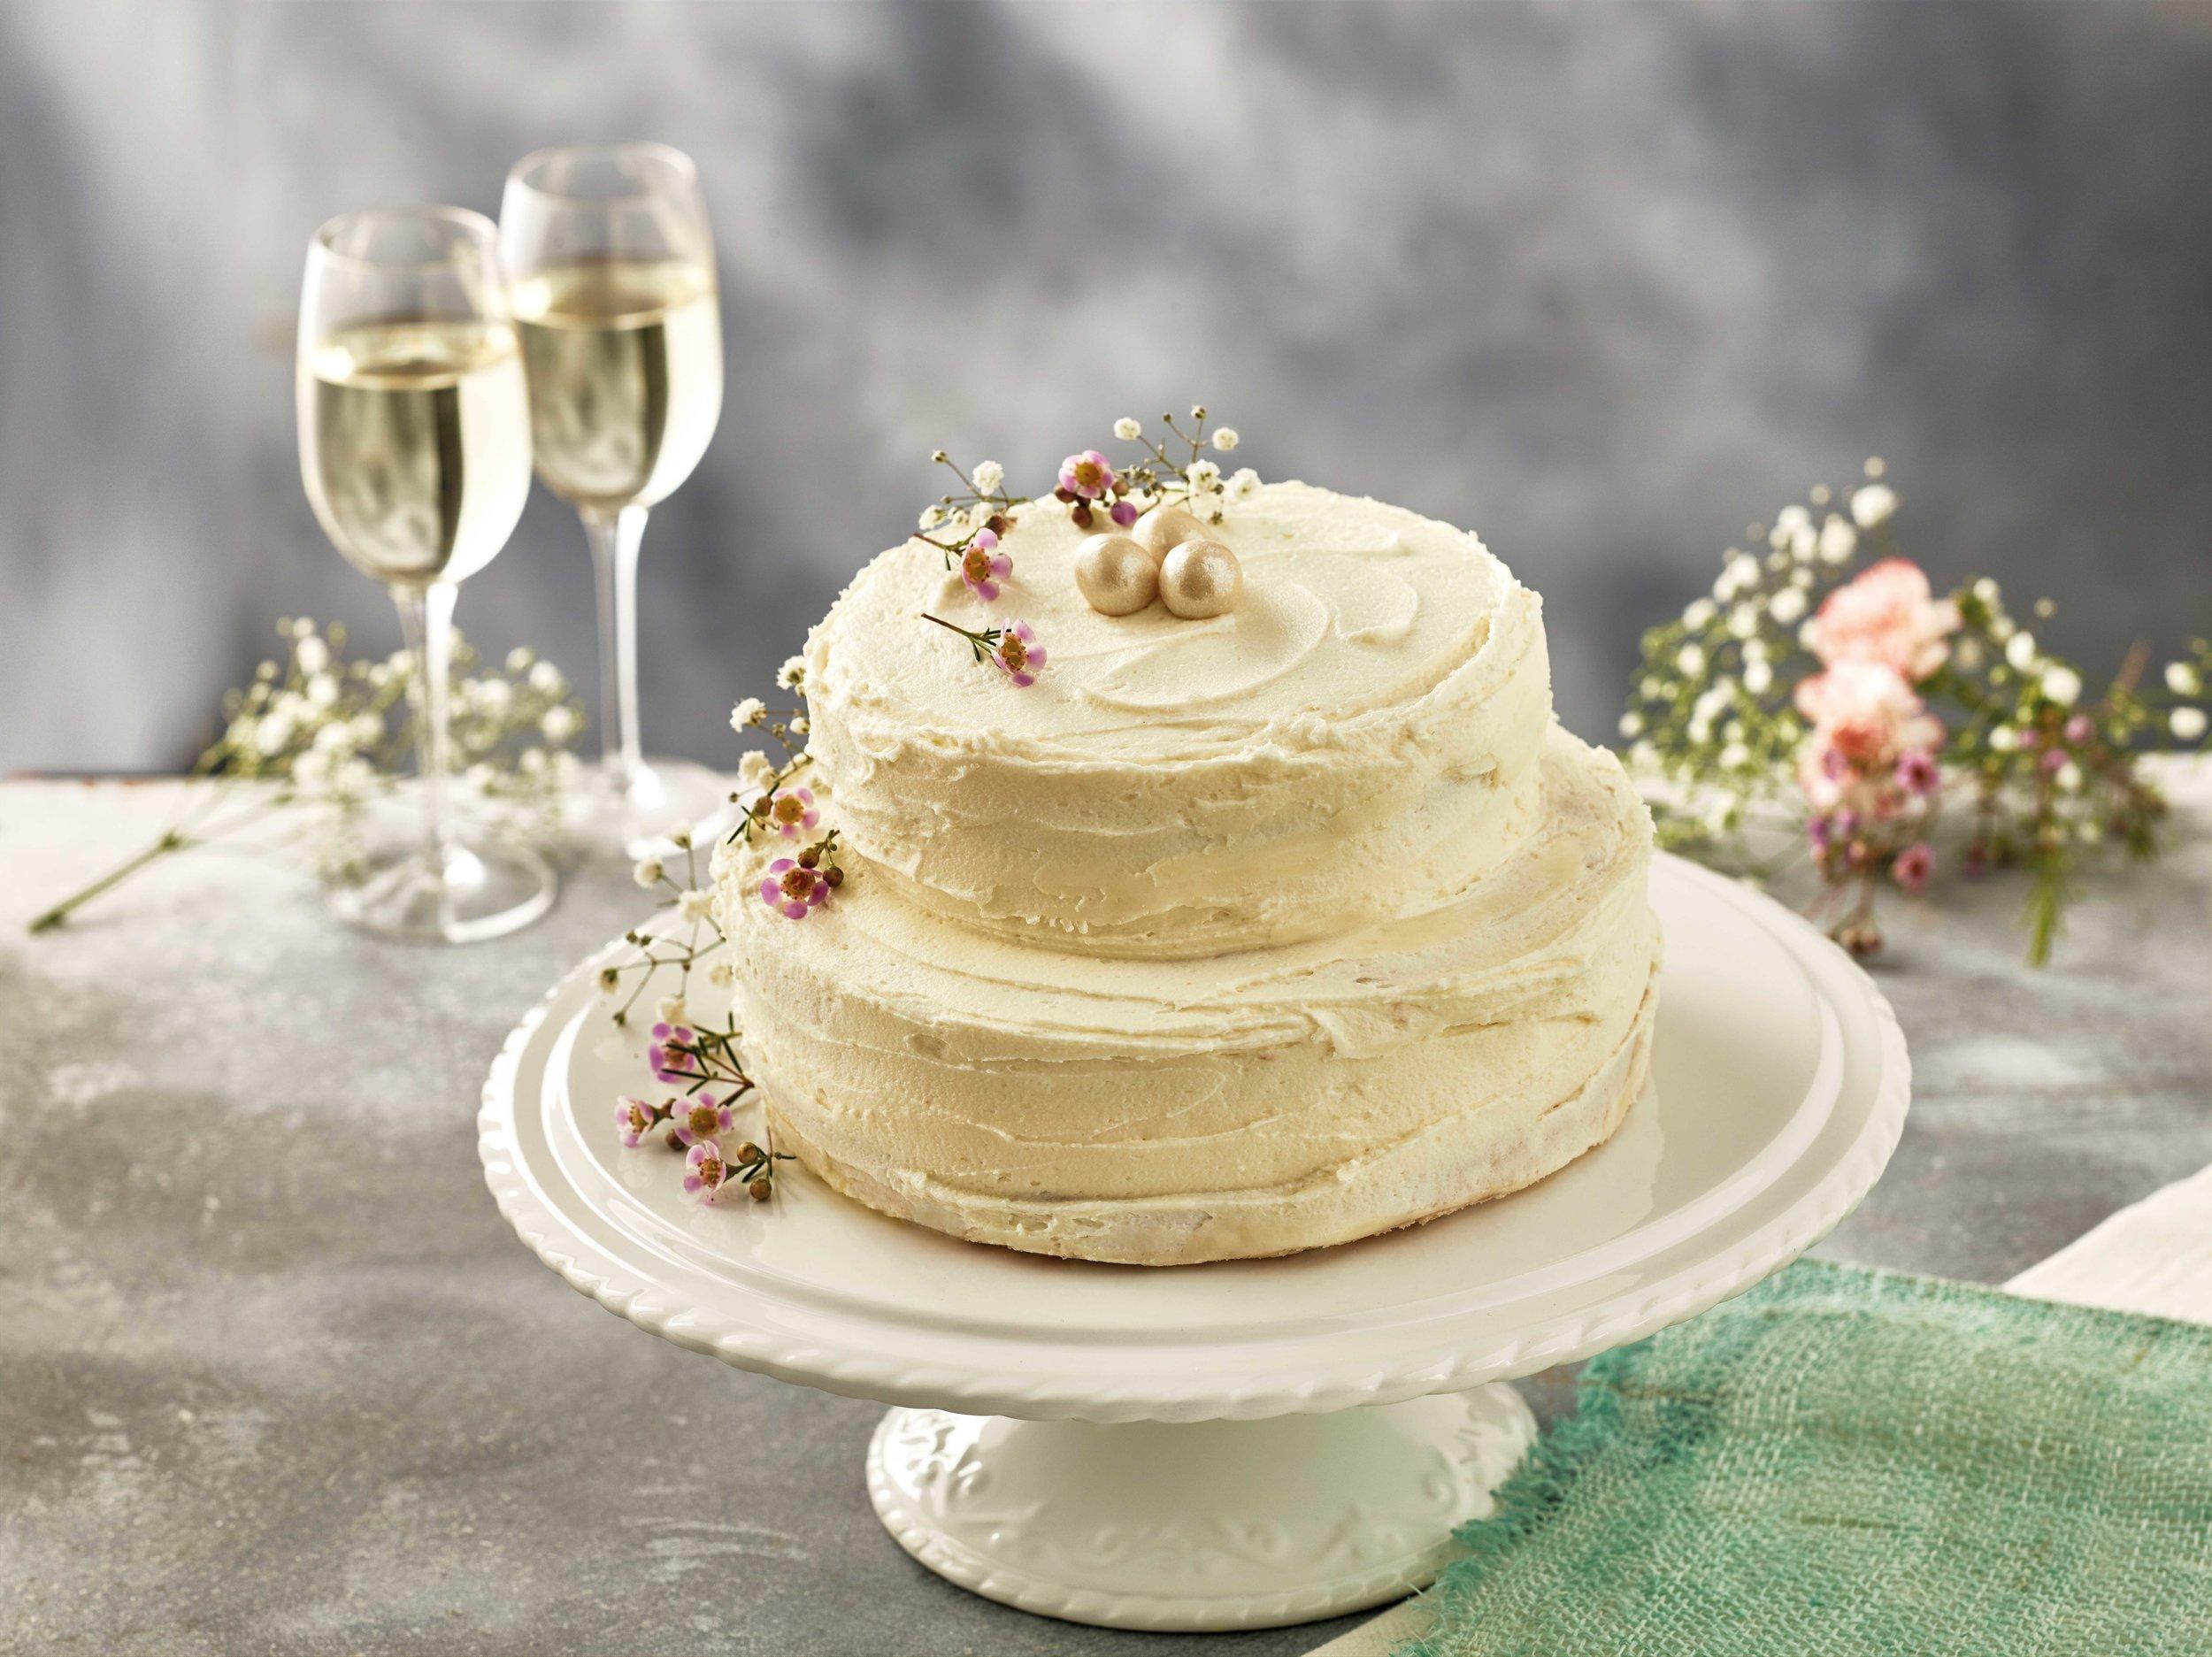 Iceland-_-Lemon-&-Elderflower-Wedding-Cake-_-Lifestyle.jpg